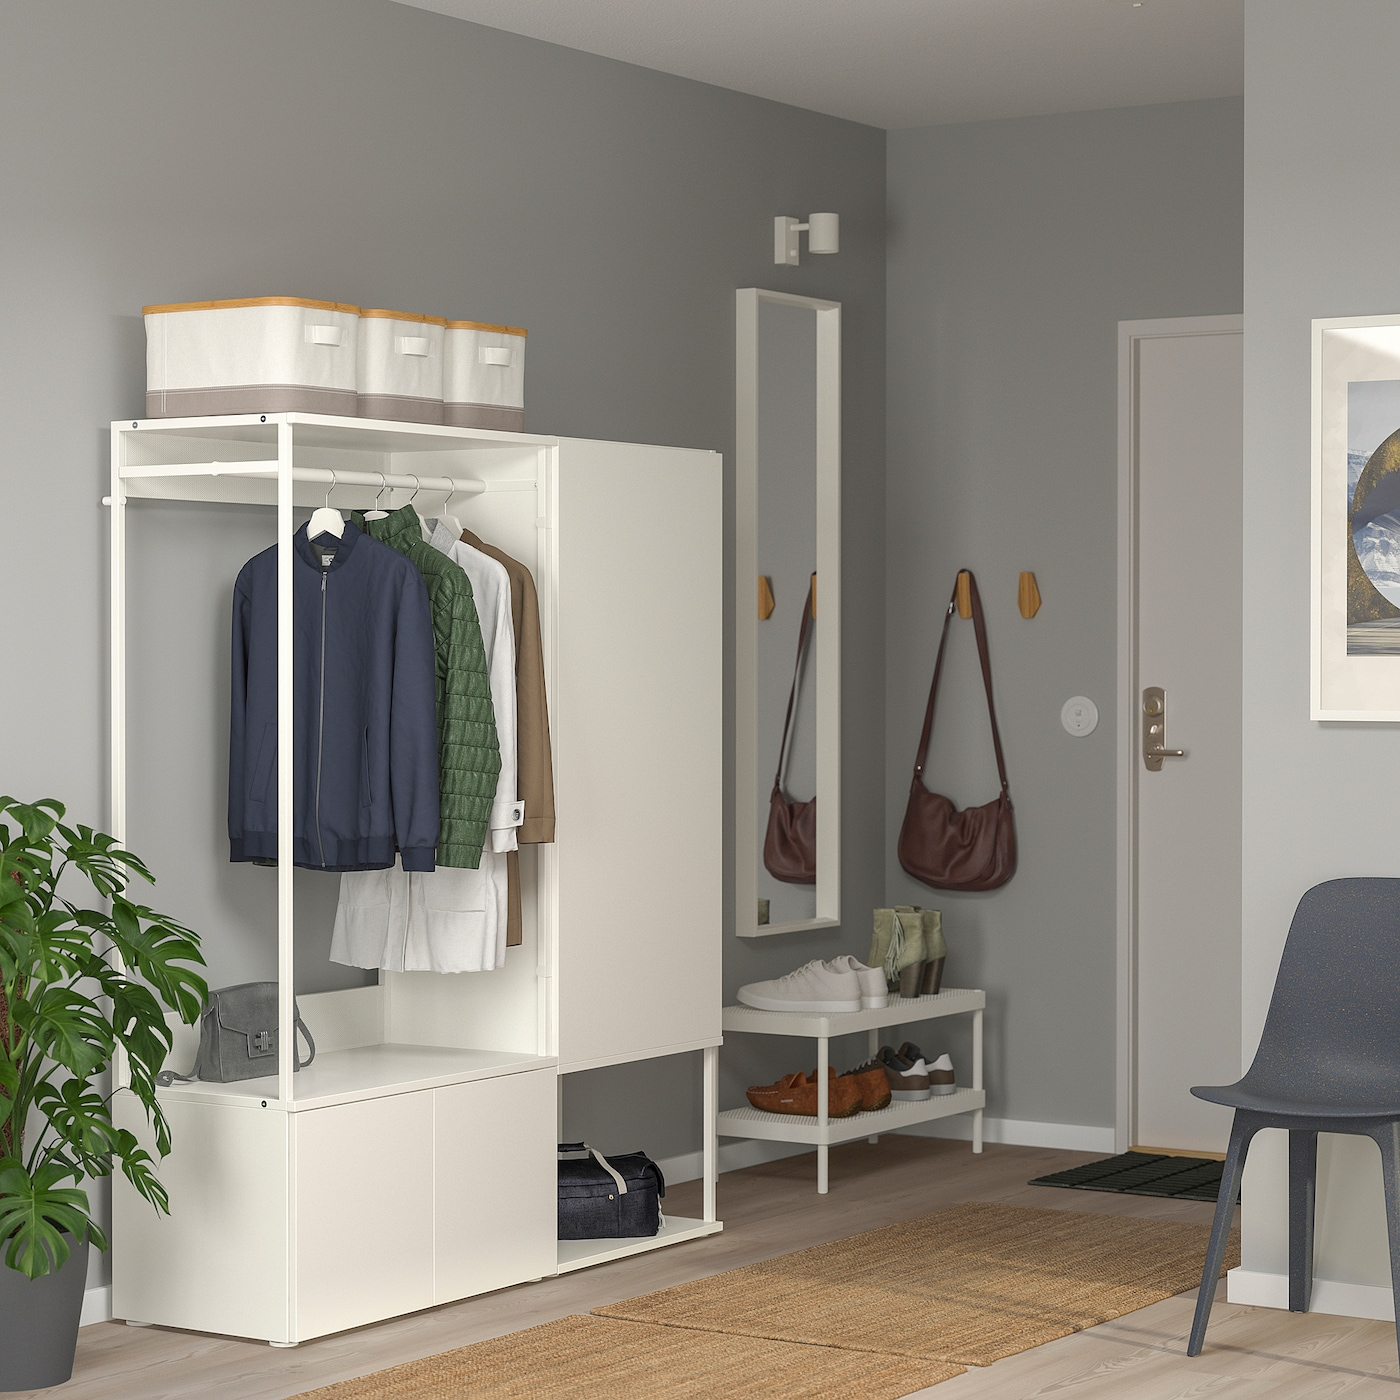 PLATSA خزانة ملابس مع 3 أبواب, أبيض/Fonnes أبيض, 140x42x161 سم